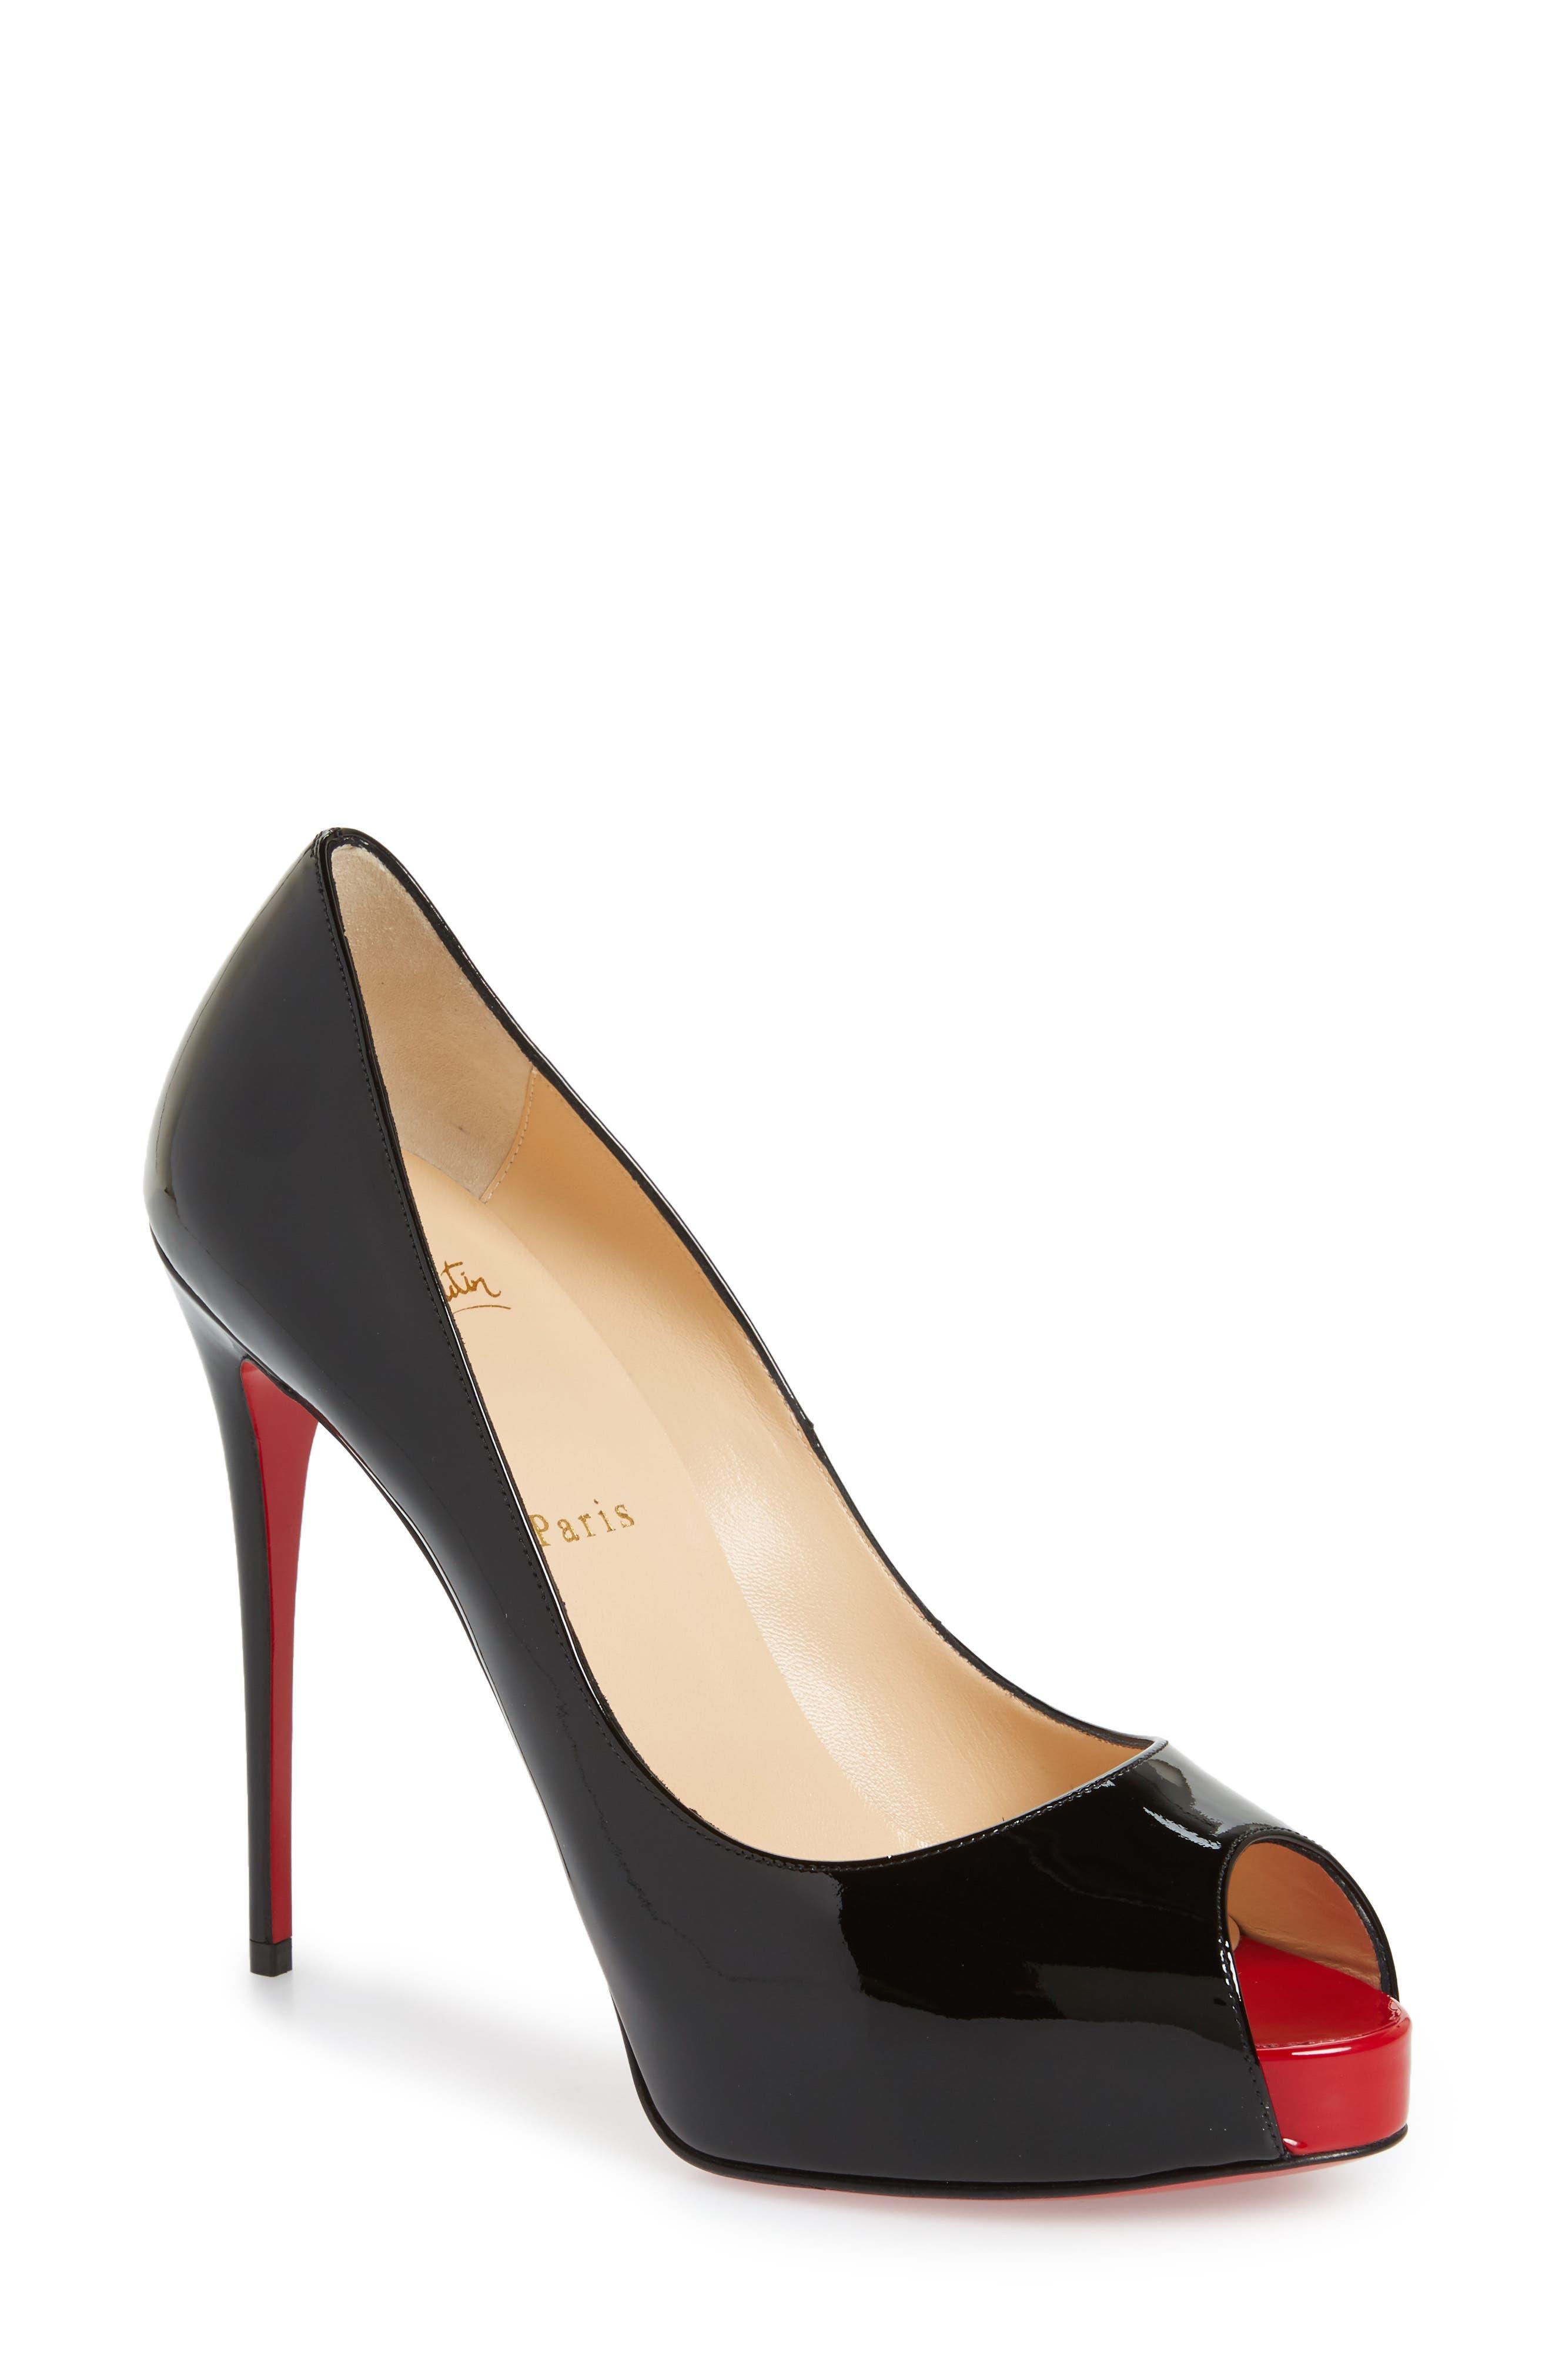 CHRISTIAN LOUBOUTIN,                             'Prive' Open Toe Pump,                             Main thumbnail 1, color,                             BLACK/ RED